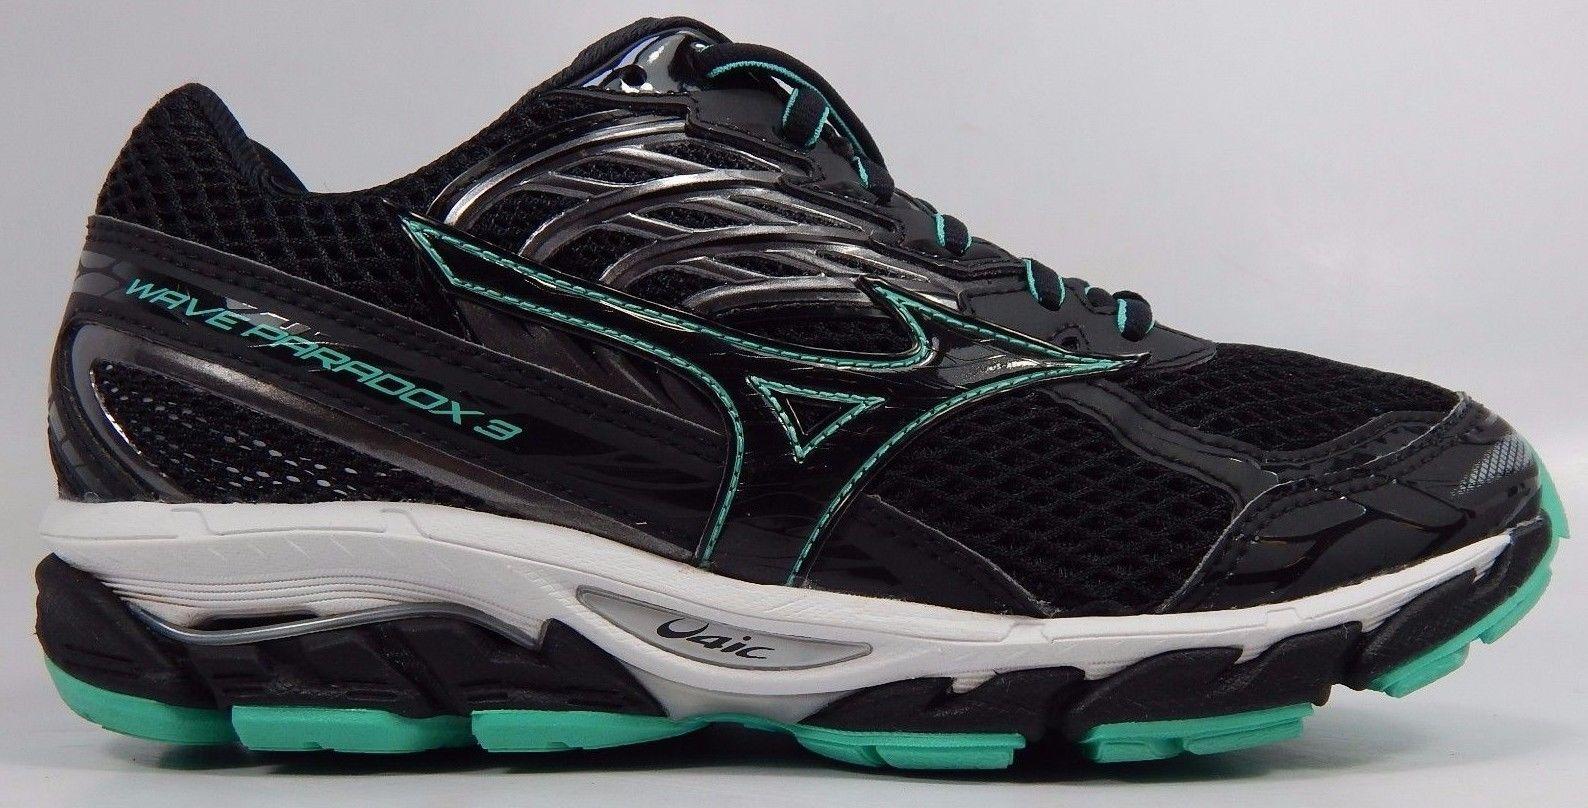 Mizuno Wave Paradox 3 Women's Running Shoes Size US 8 M (B) EU 38.5 Black Green